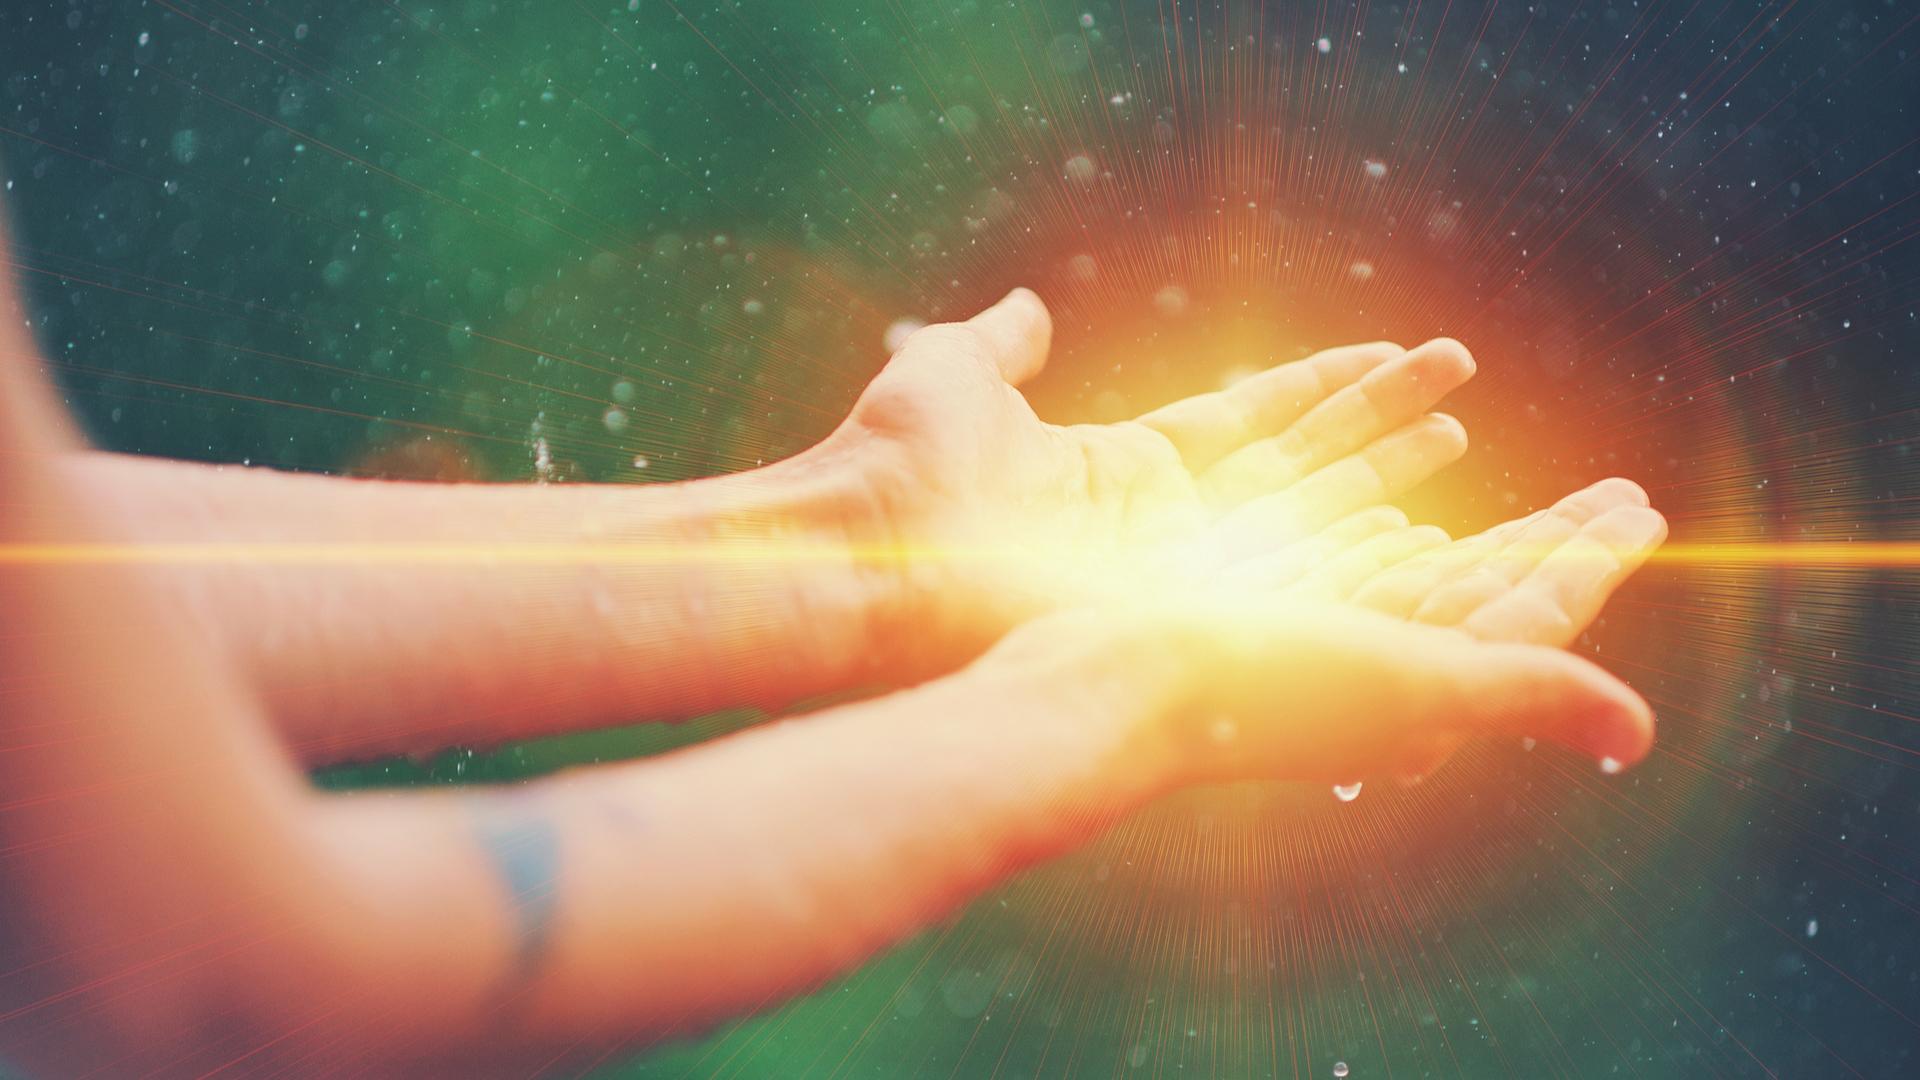 082: The Spirituality of Accountability